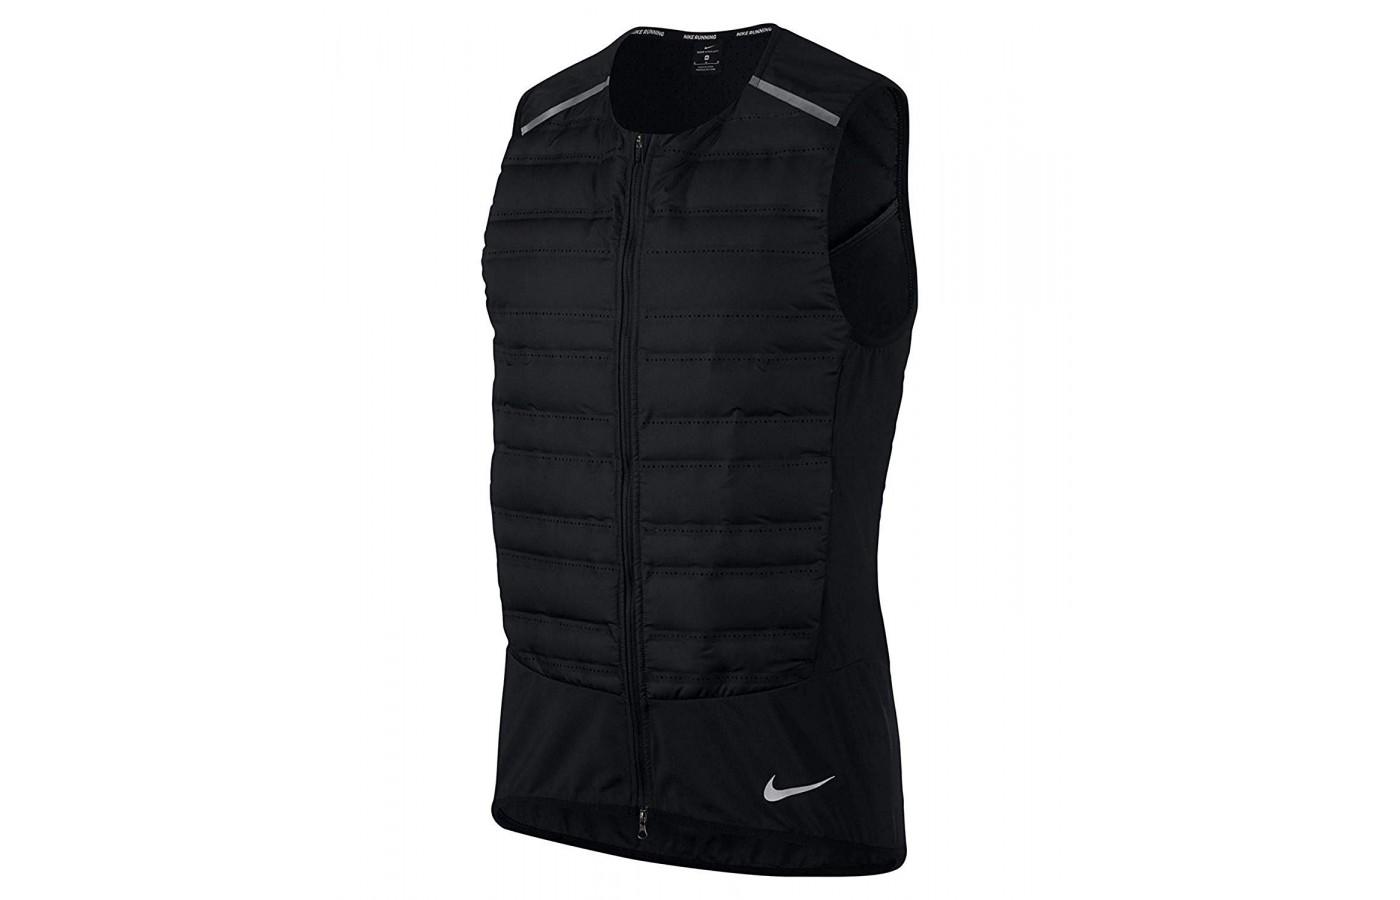 Nike Aeroloft Vest front